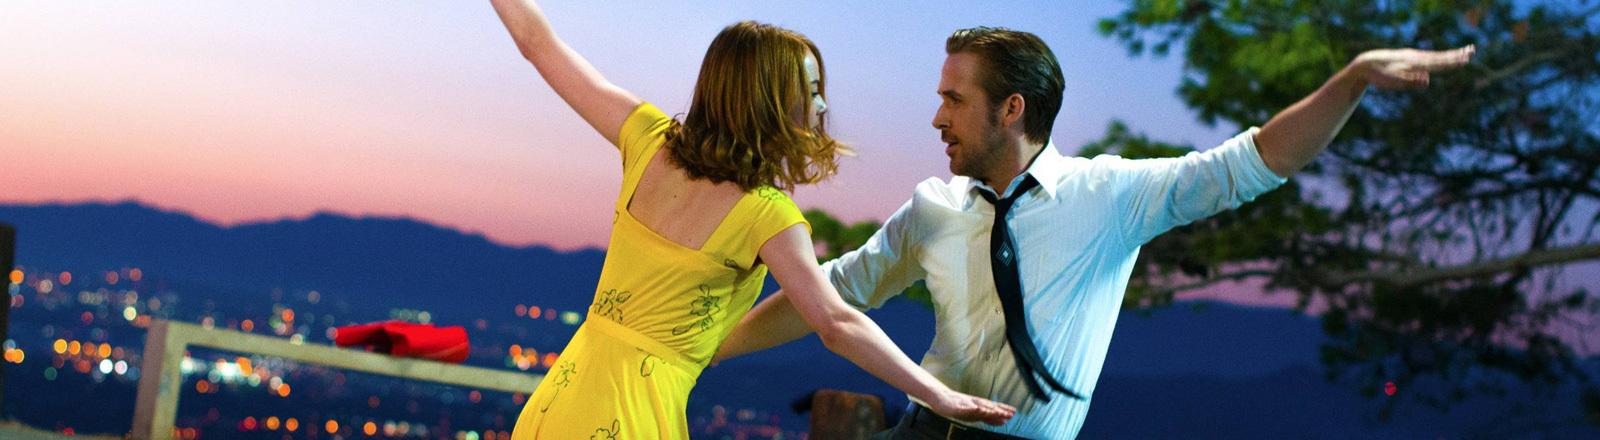 Szene aus dem Filmmusical La La Land.